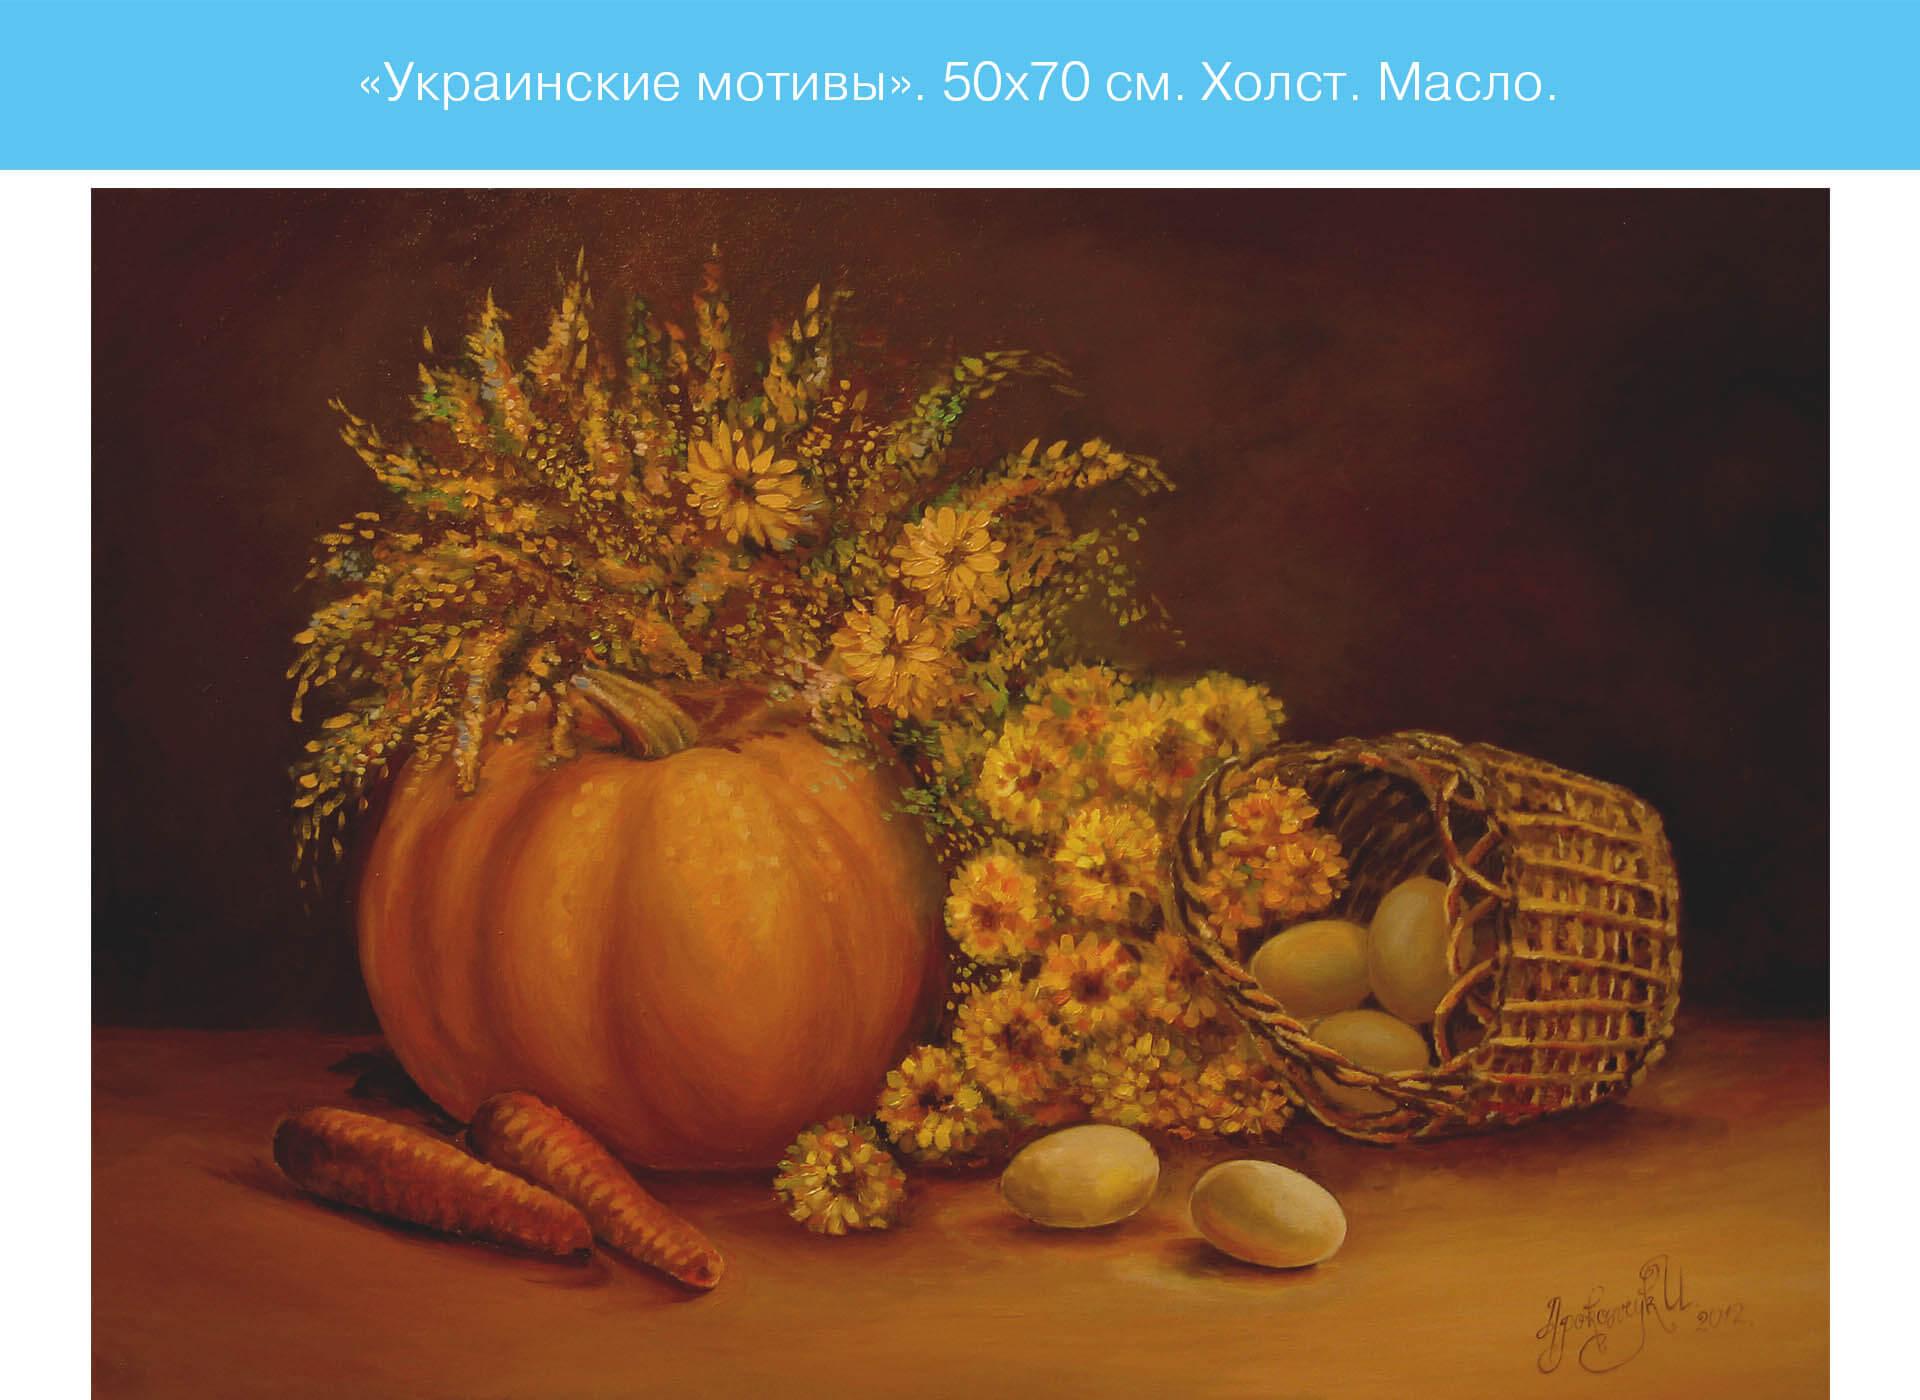 Prokochuk_Irina_picture_ukrainskiye_motivy